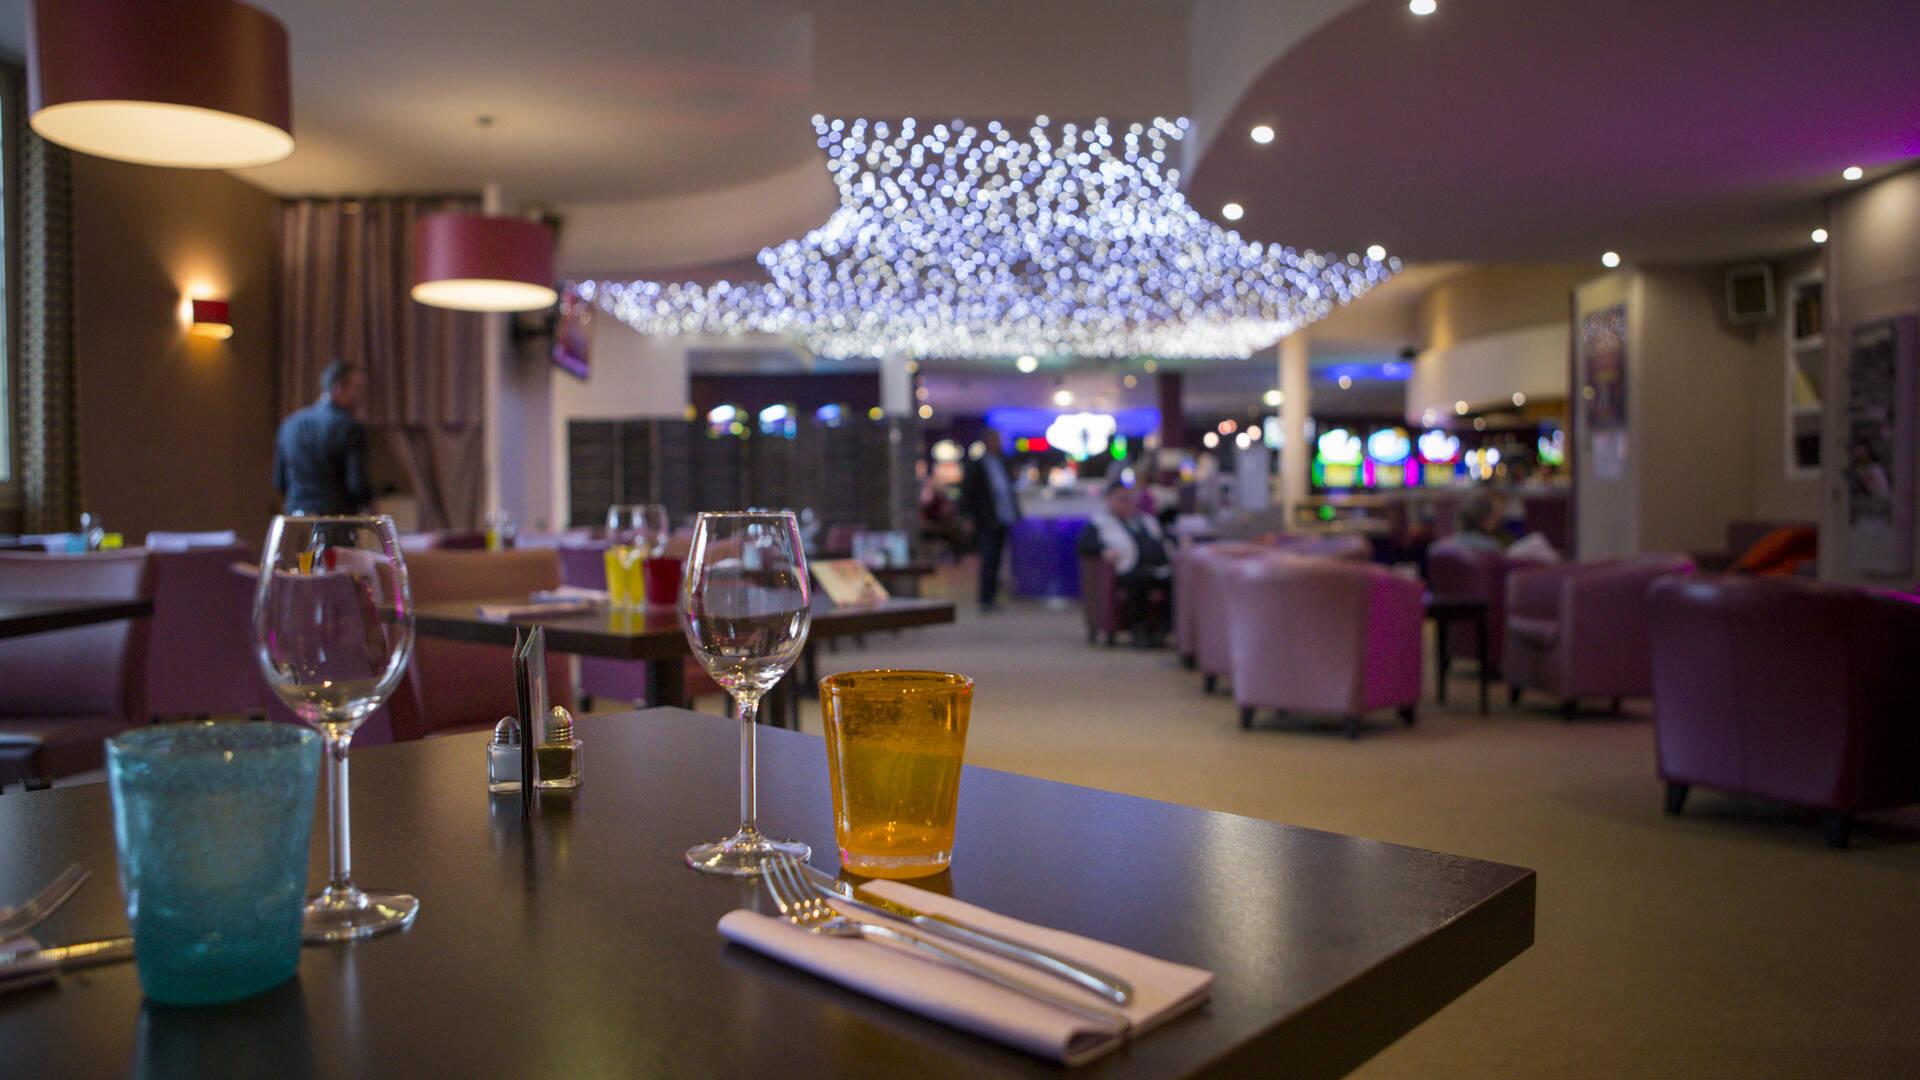 Le Comptoir de Rose, restaurant du casino, Fouras-les-Bains, Rochefort Océan